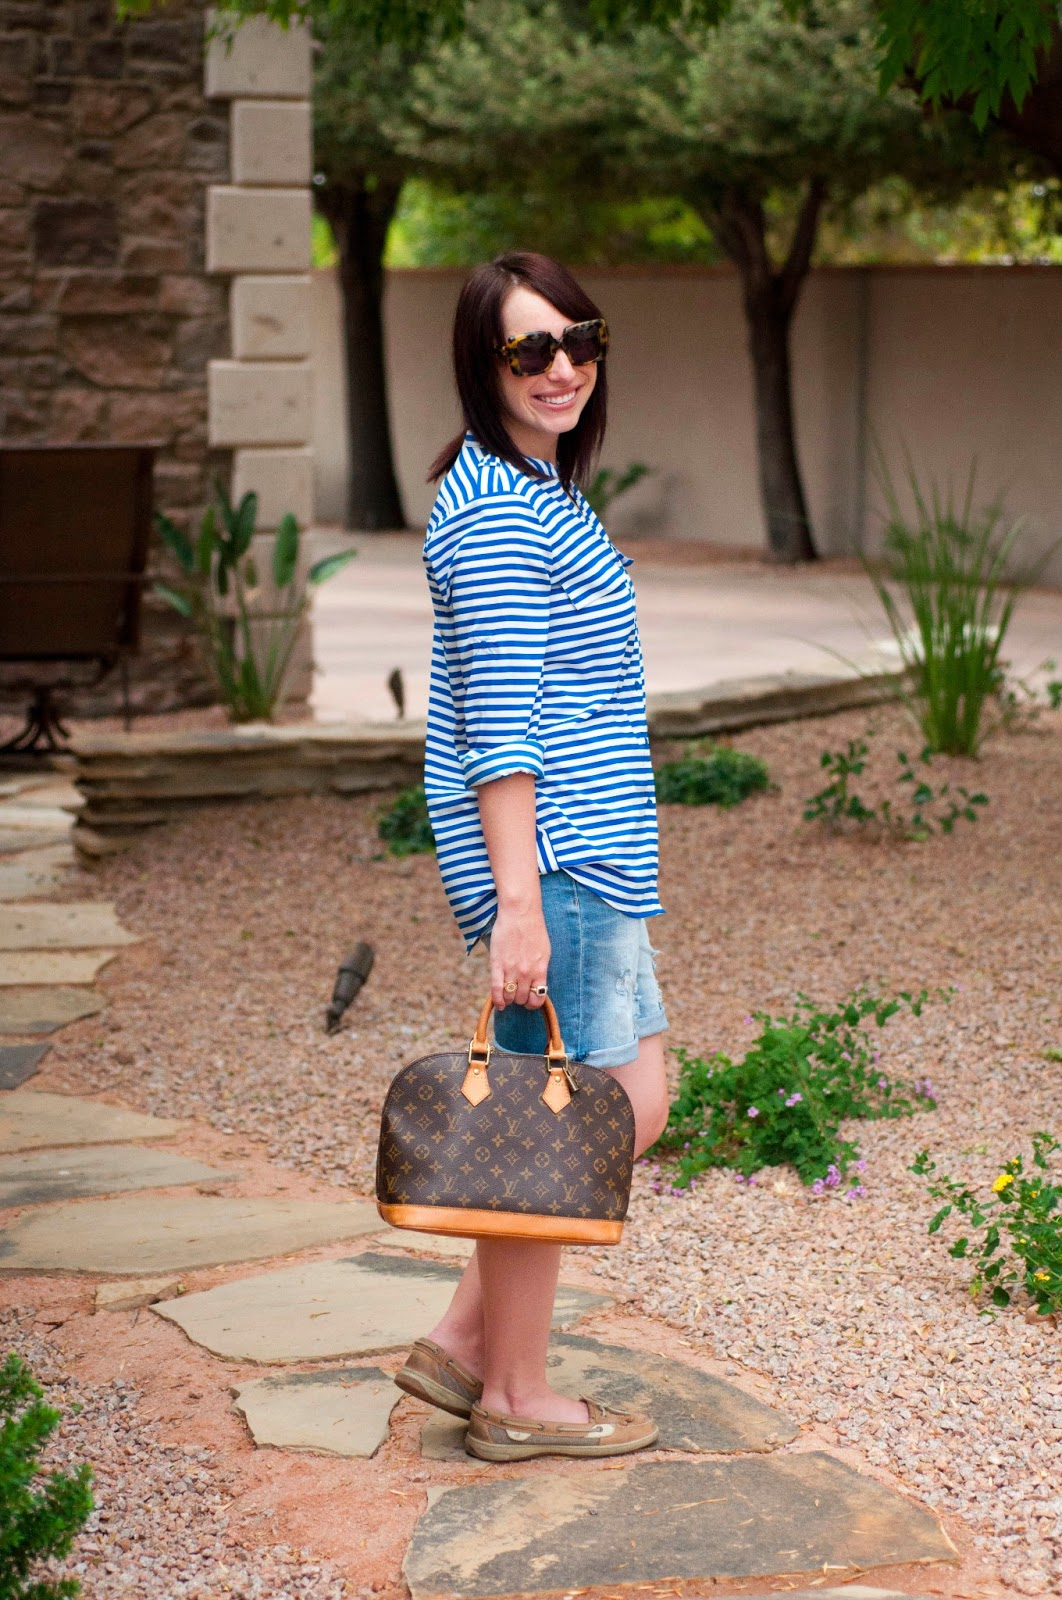 fashion blog, style blog, louis vuitton alma, sperry topsider for women, calvin klein striped shirt, boyfreind jeans